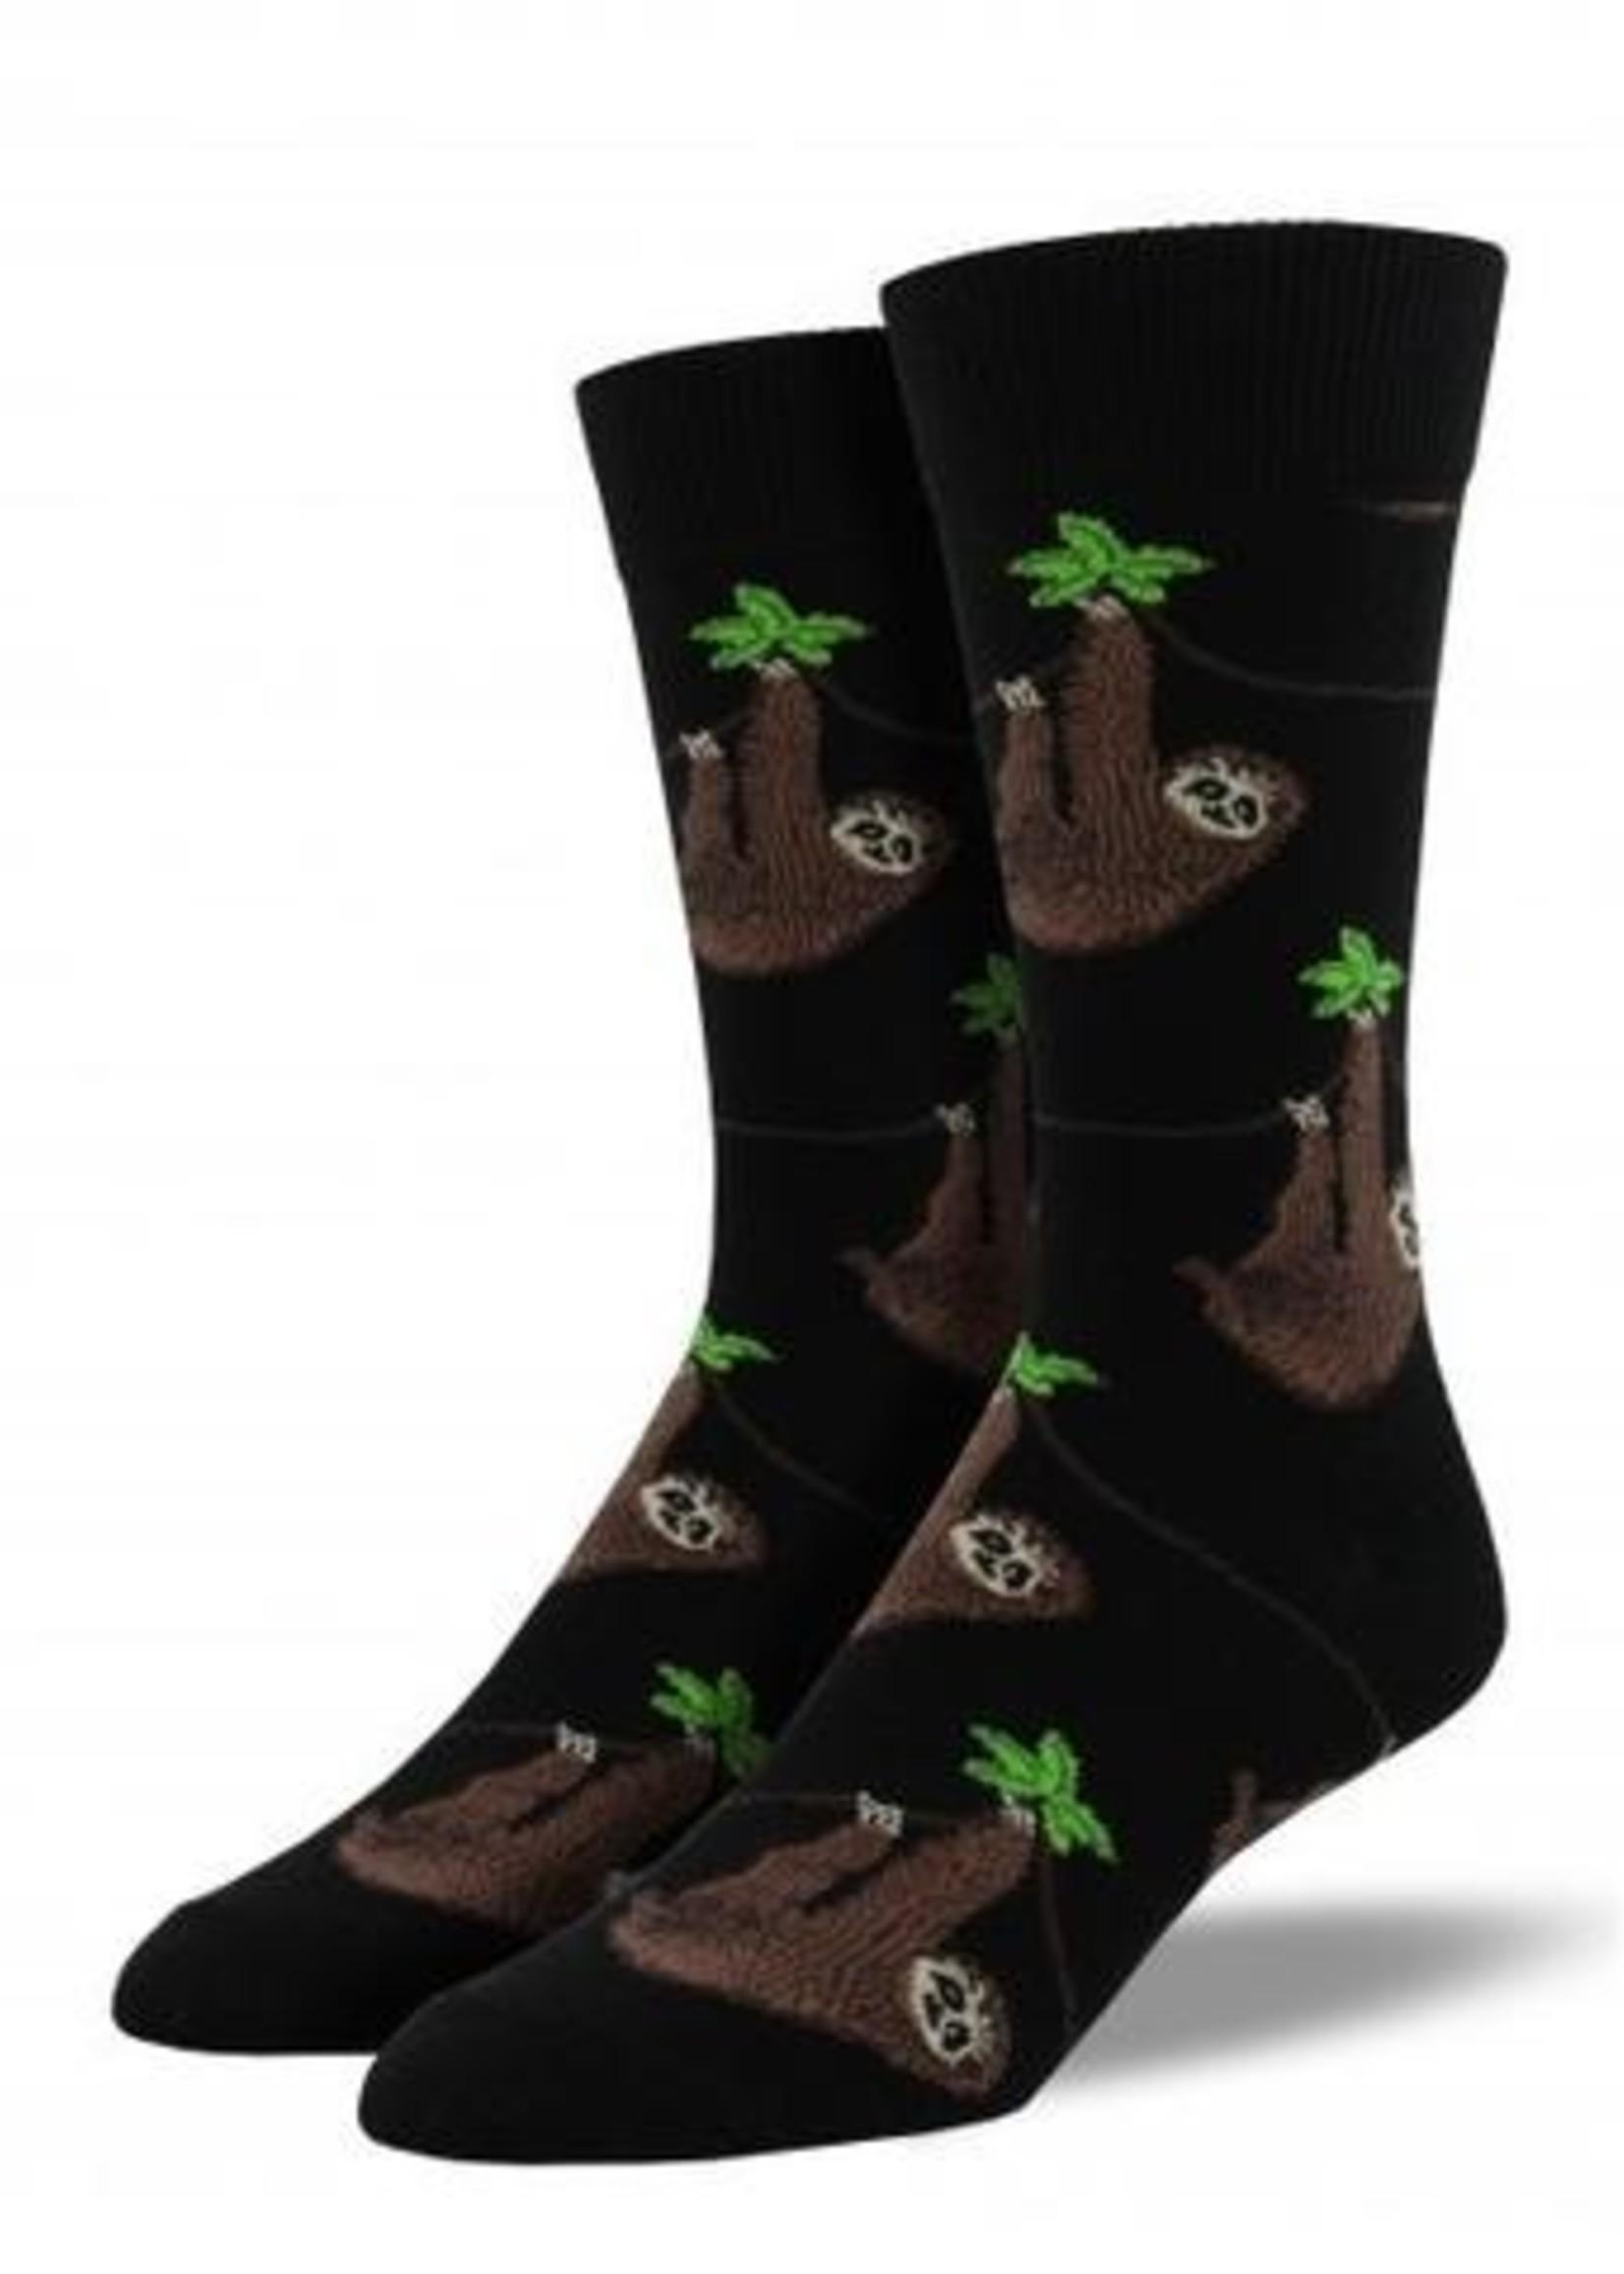 Socksmith Canada Inc MEN'S SLOTH SOCKS